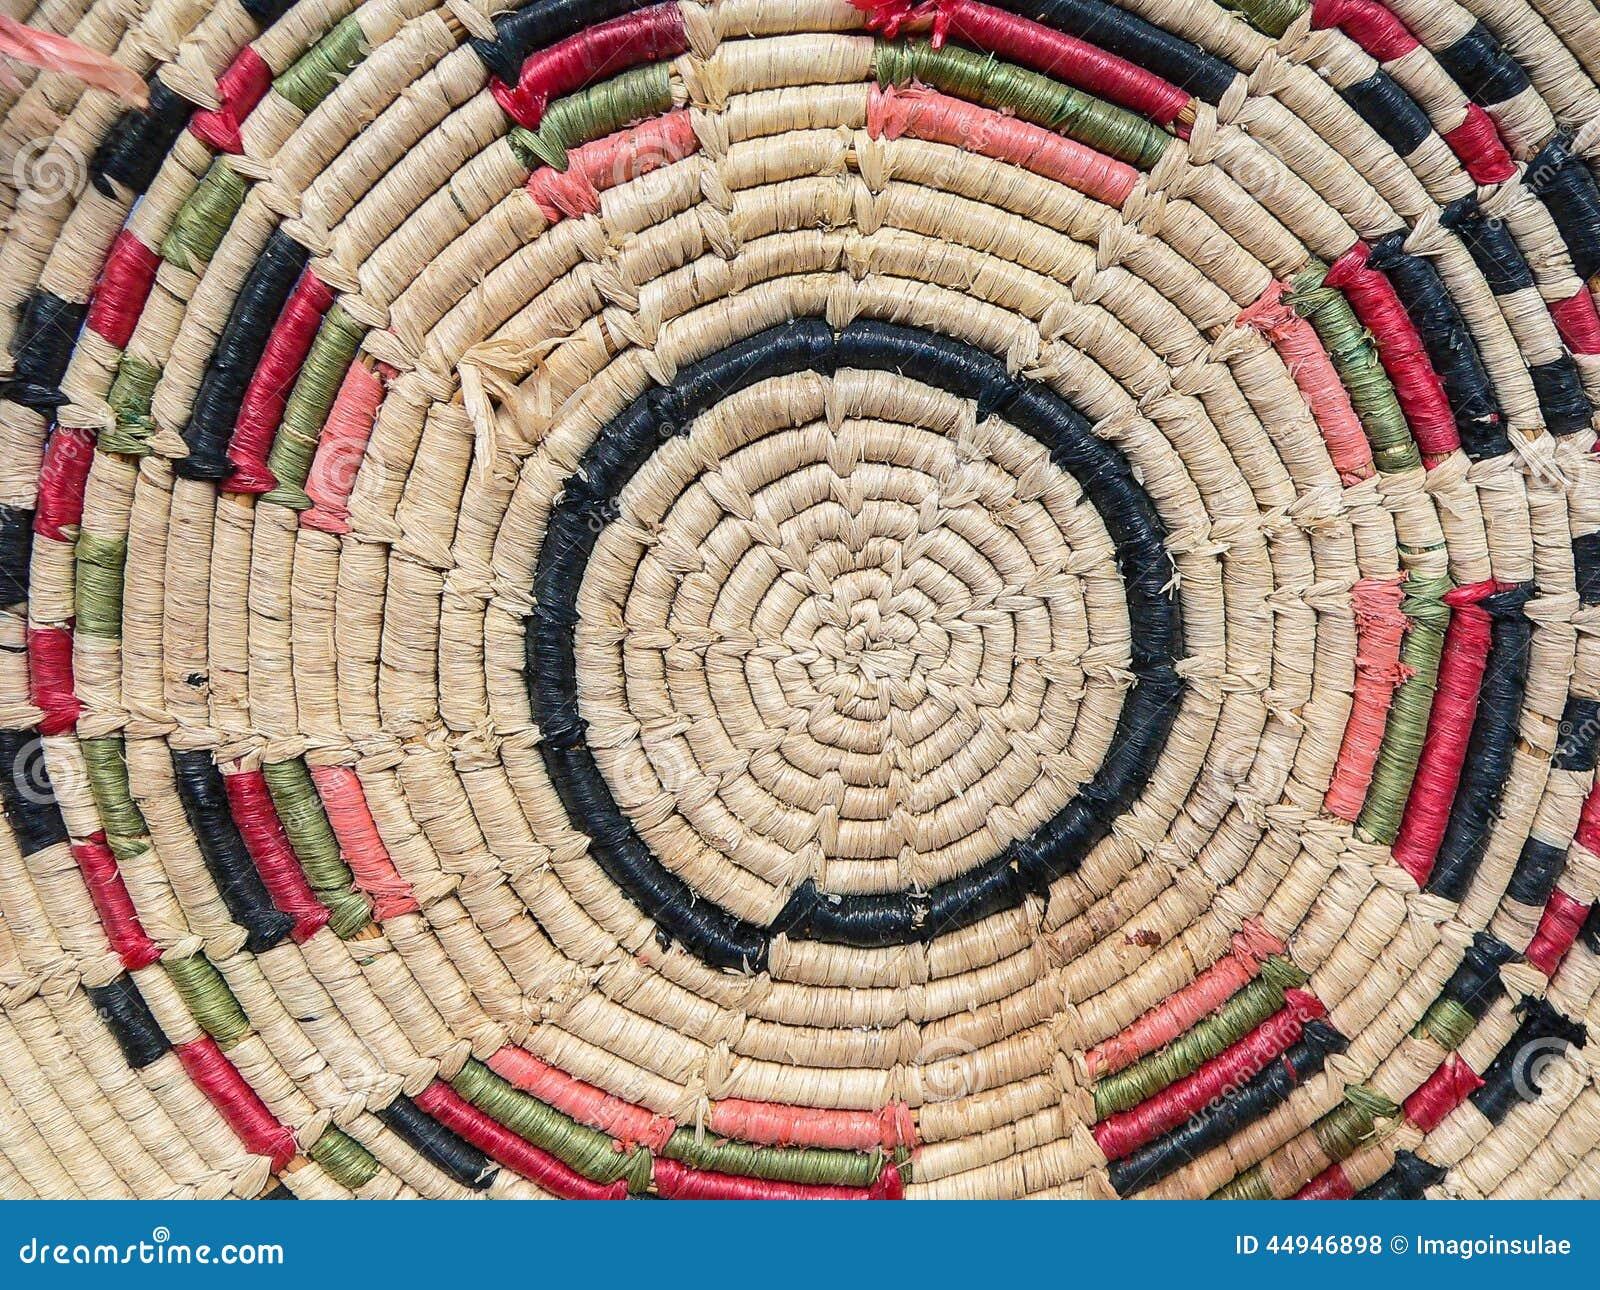 Handicraft. Basket